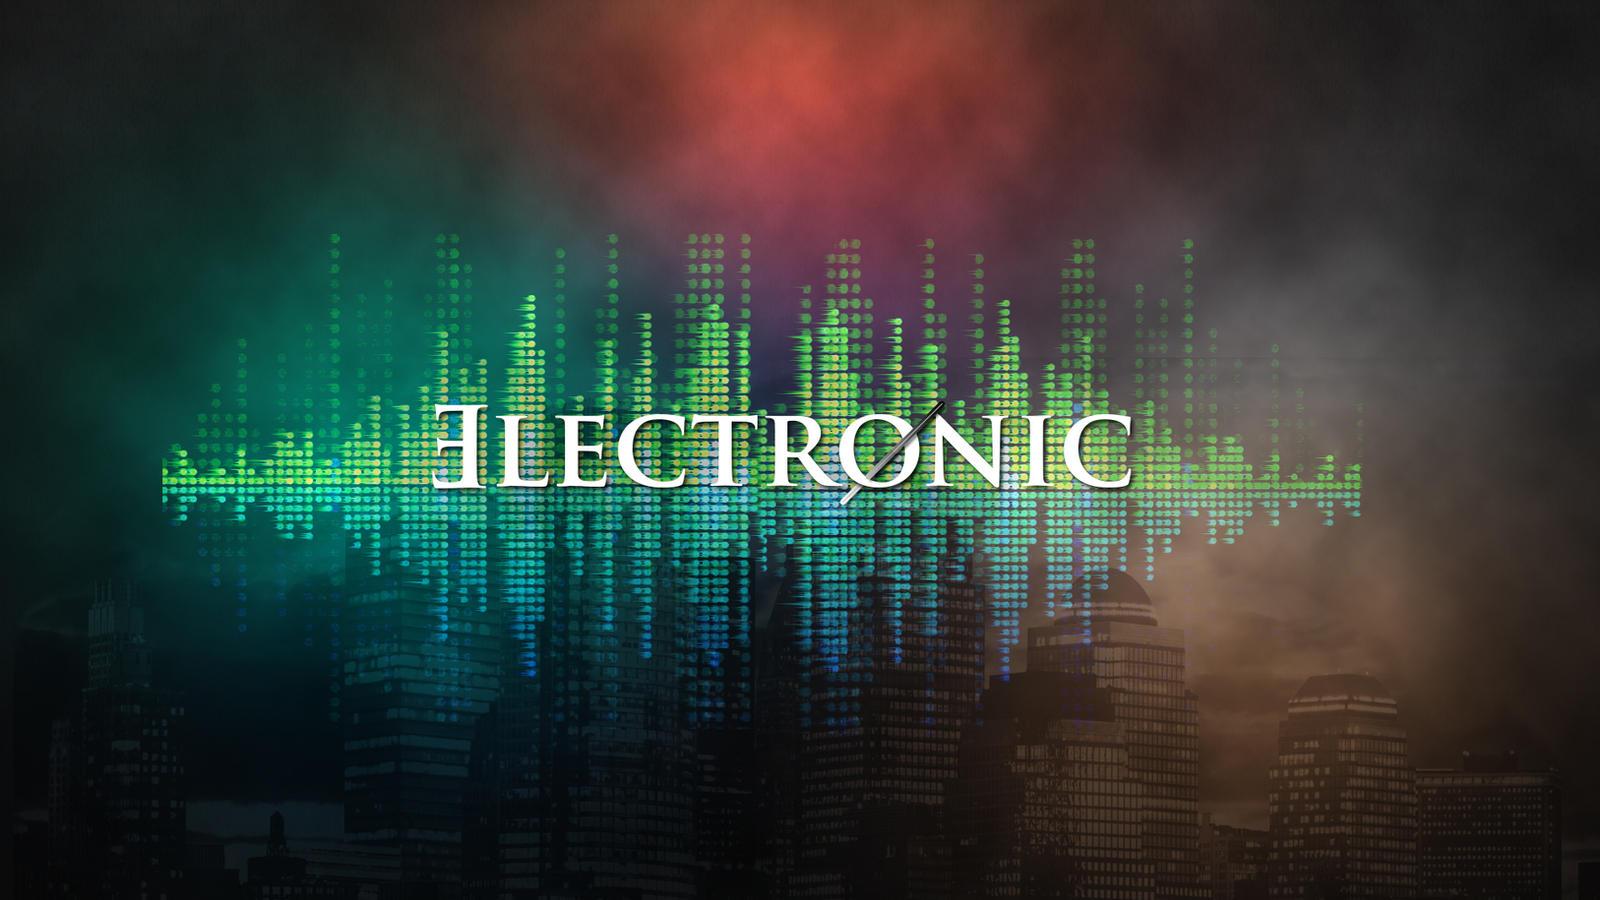 electronic music by mr zd on deviantart